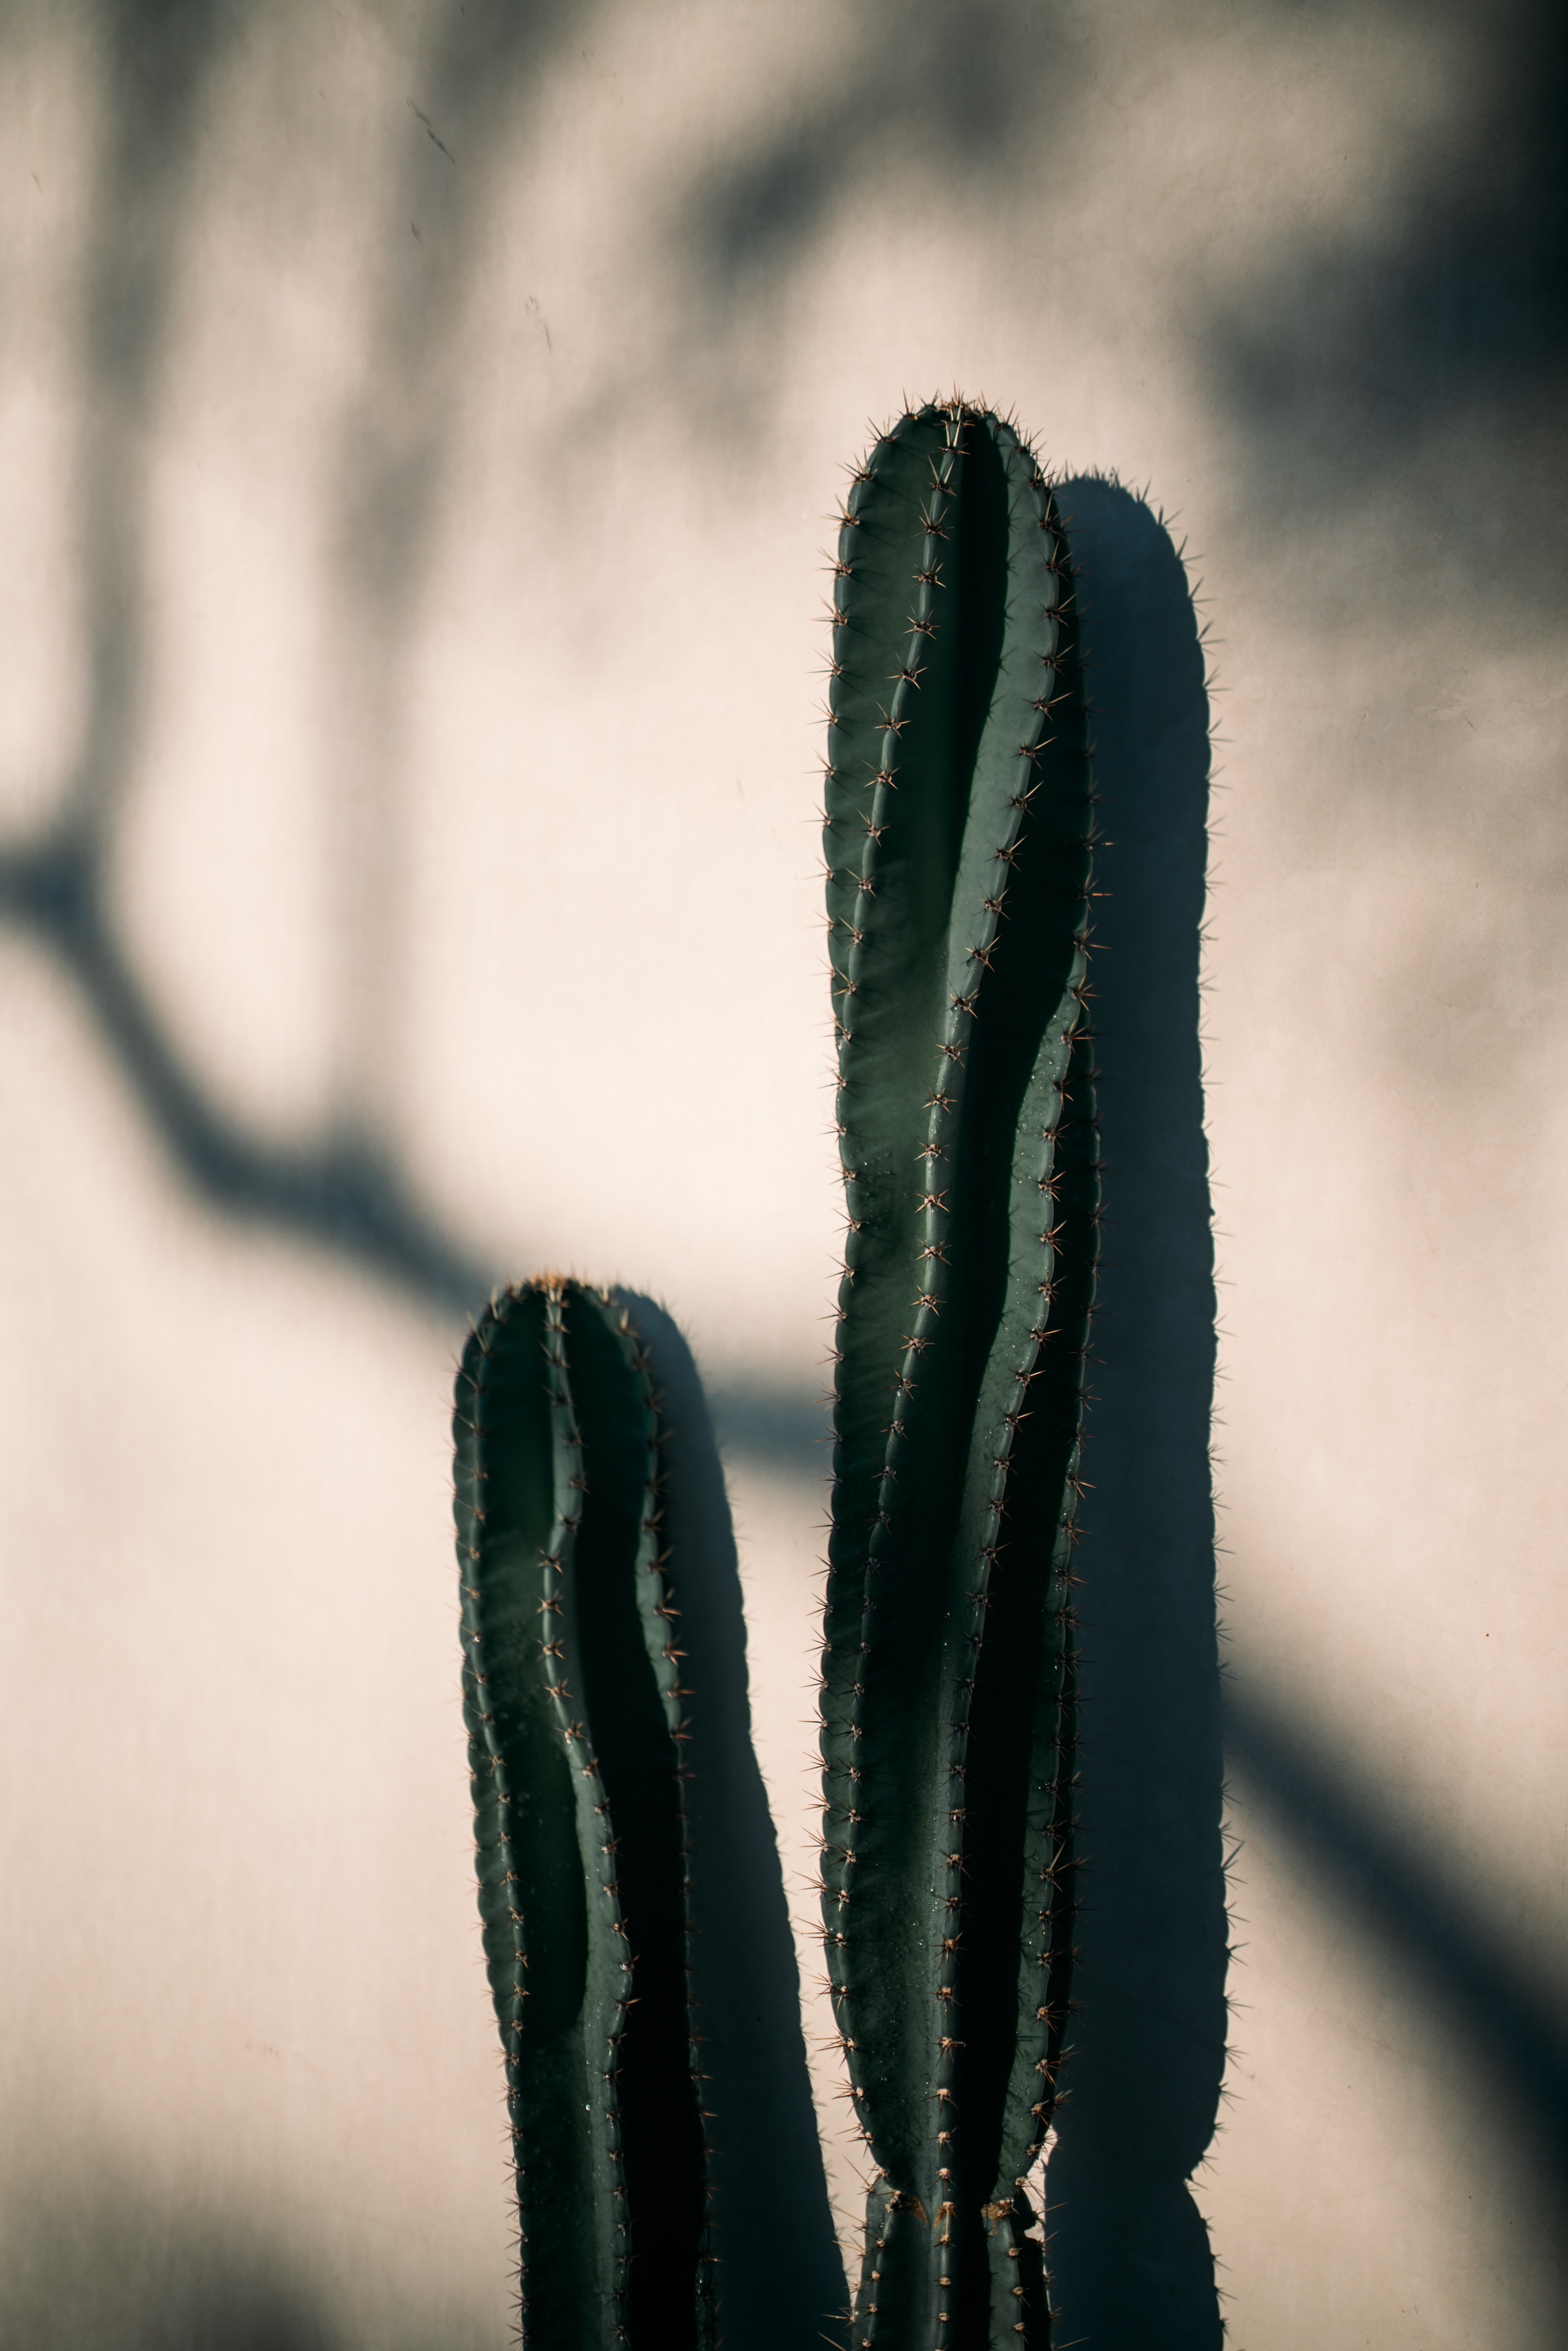 cactus plant beside beige wall